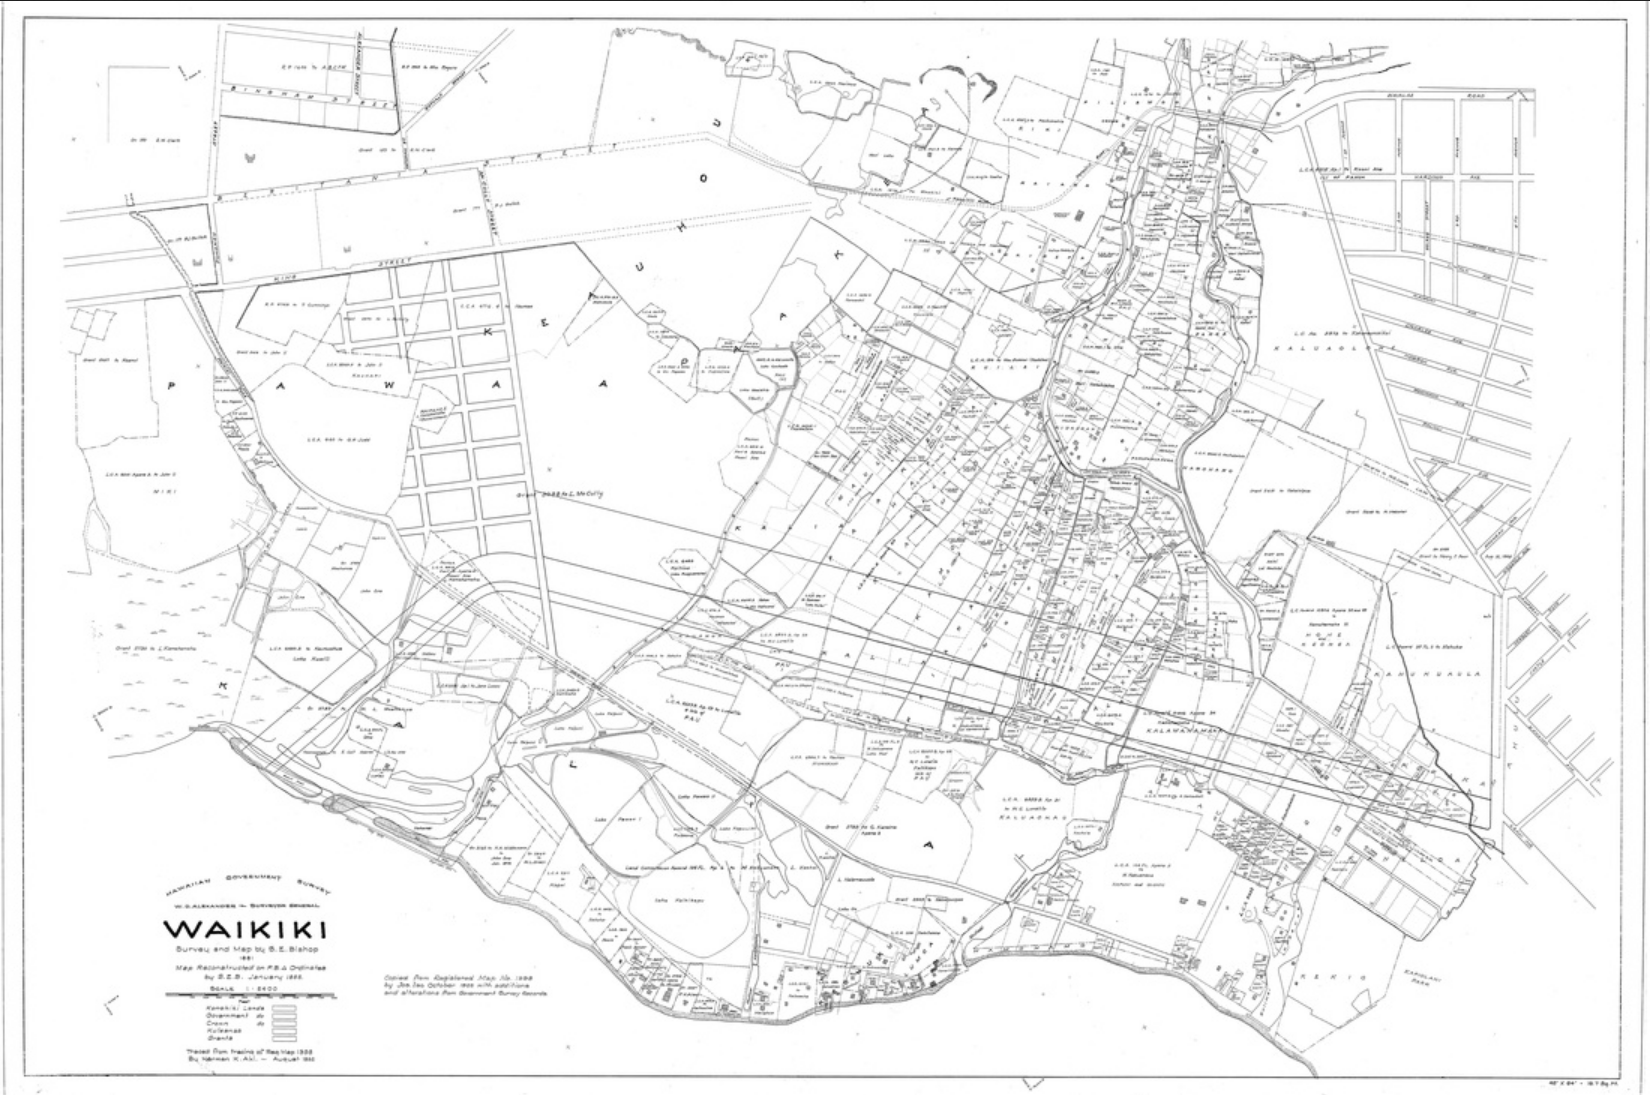 AVAKonohiki Waikiki historical map.